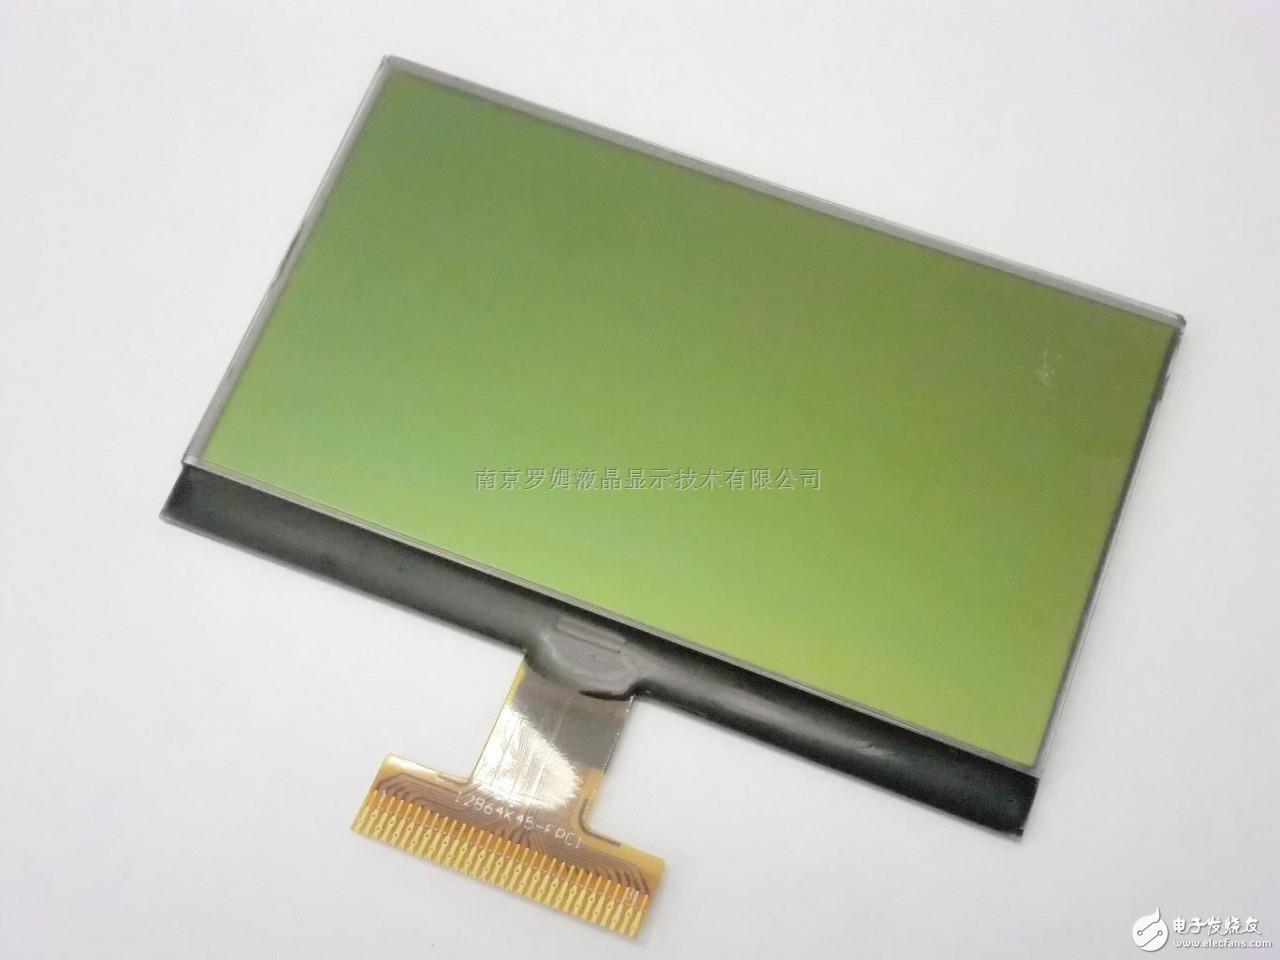 LCD液晶屏与OLED液晶屏的区别